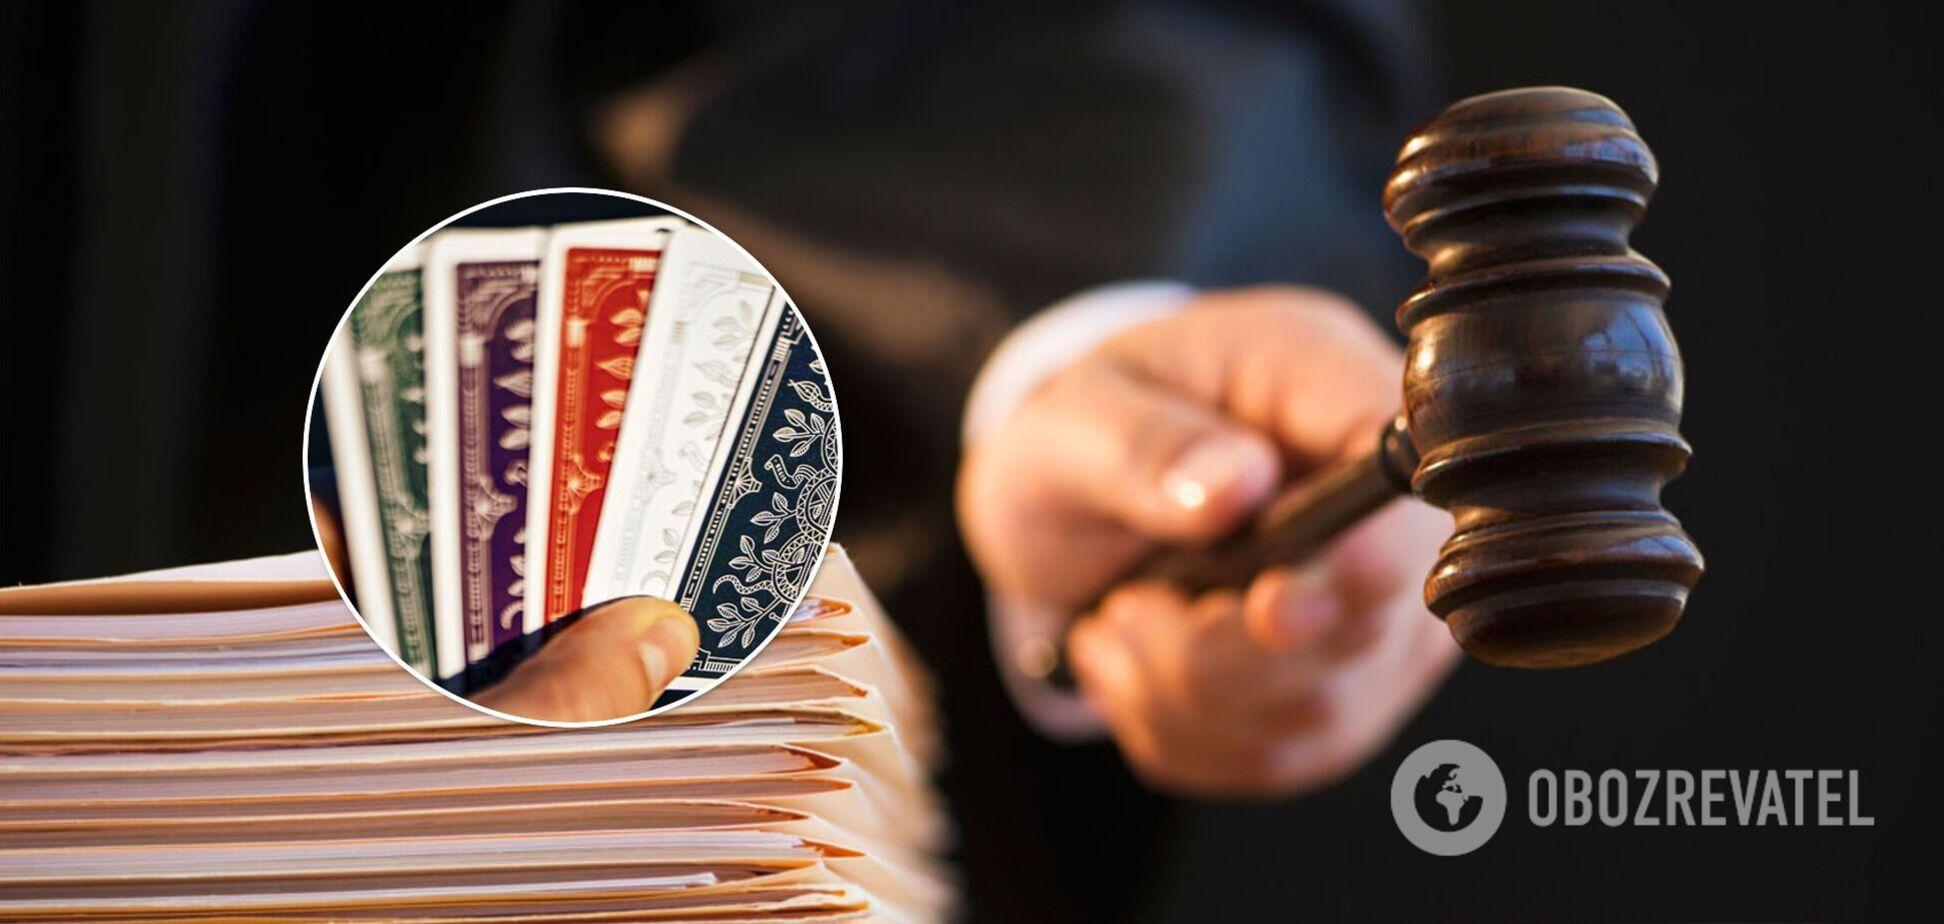 Украинец заработал 70 грн на 'порнокартах' и пошел под суд